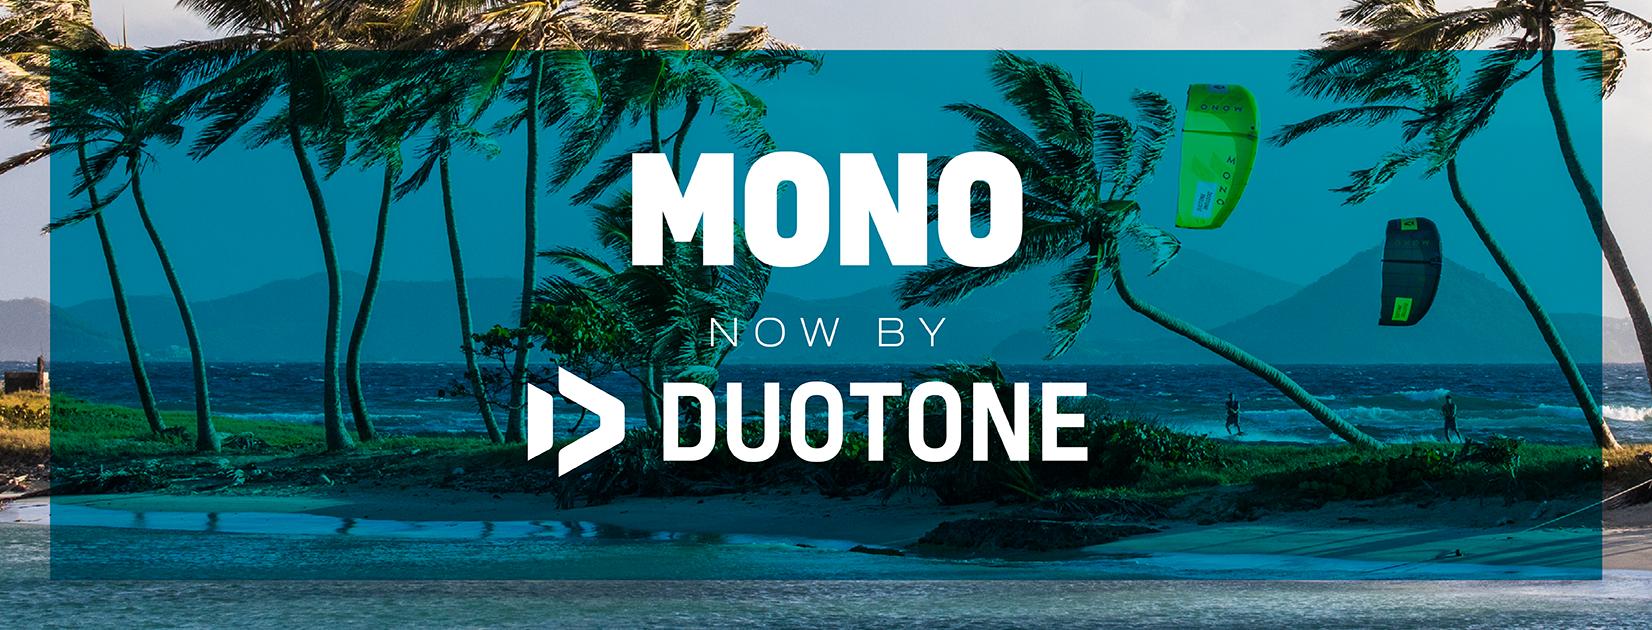 kite duotone mono foil